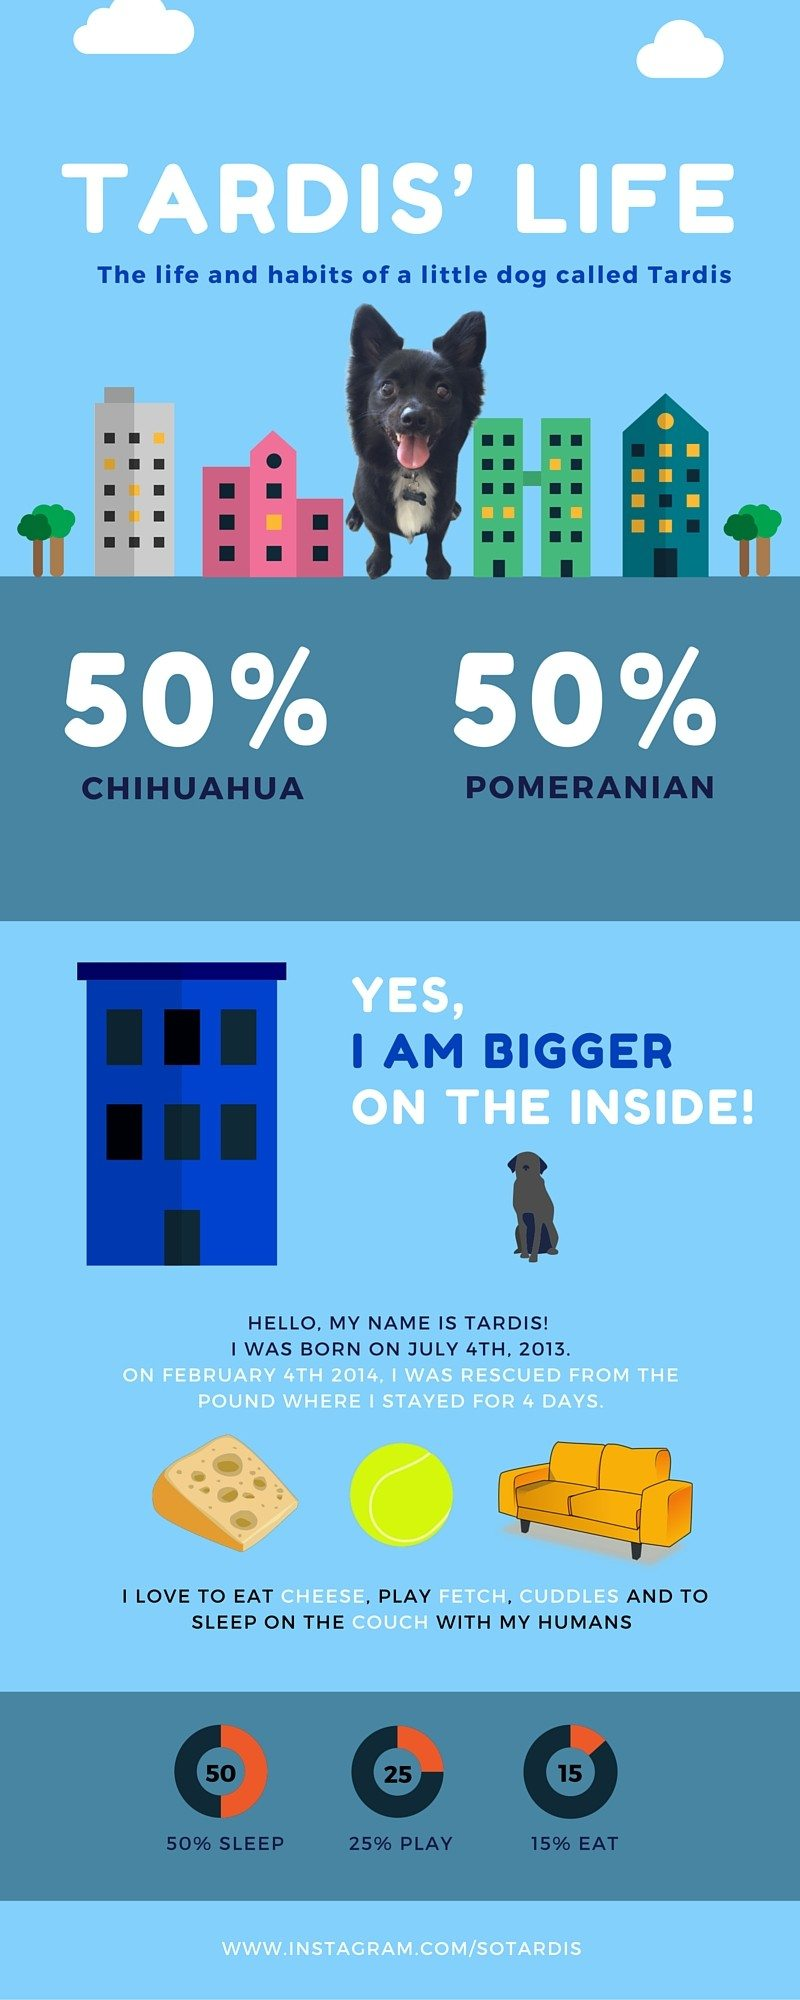 Tardis Life infographic